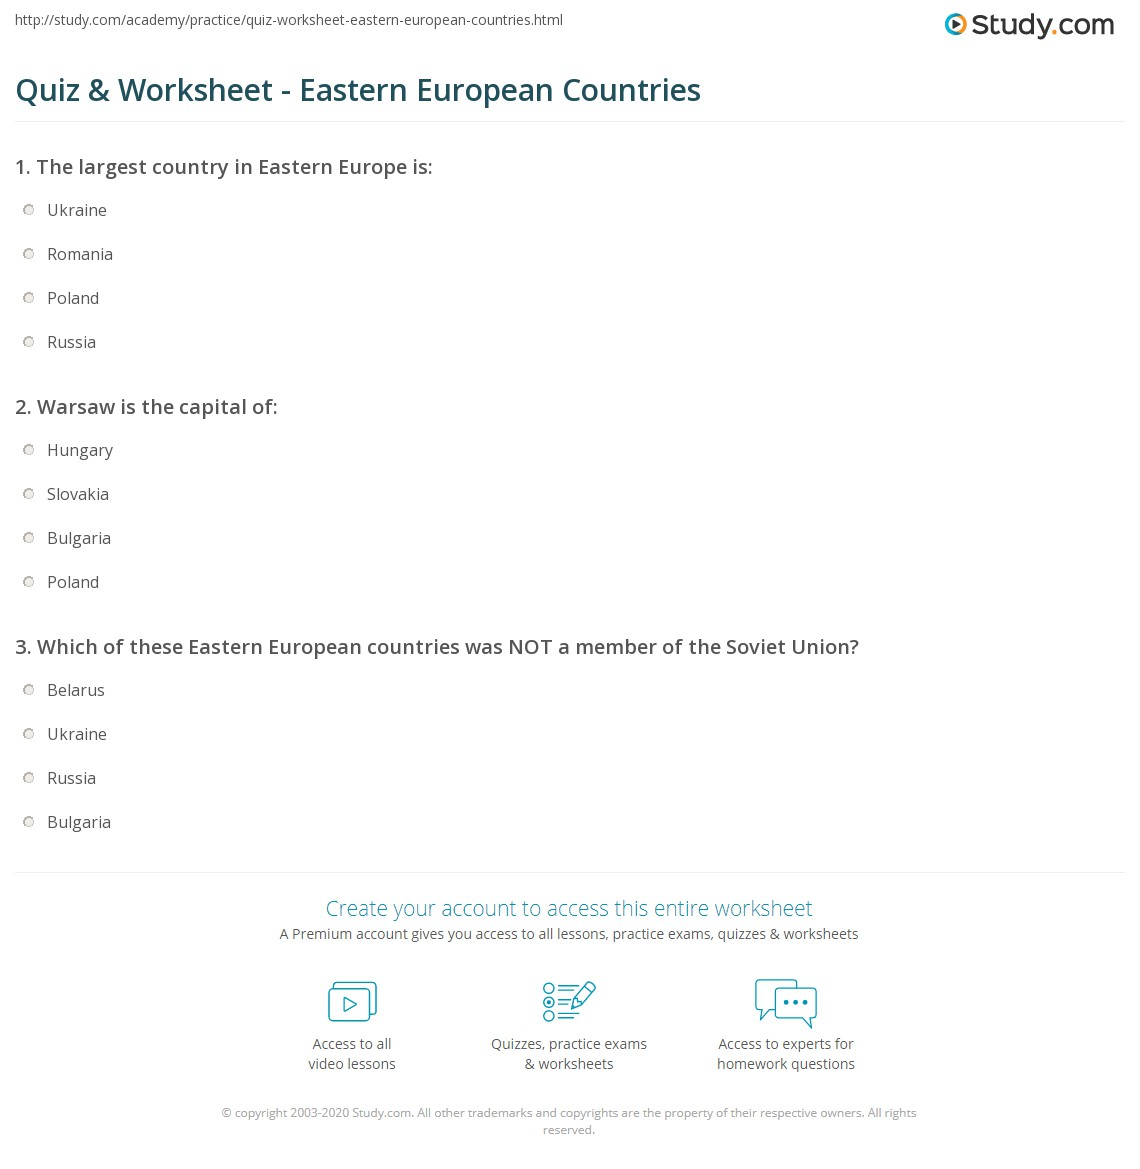 Quiz & Worksheet - Eastern European Countries | Study.com